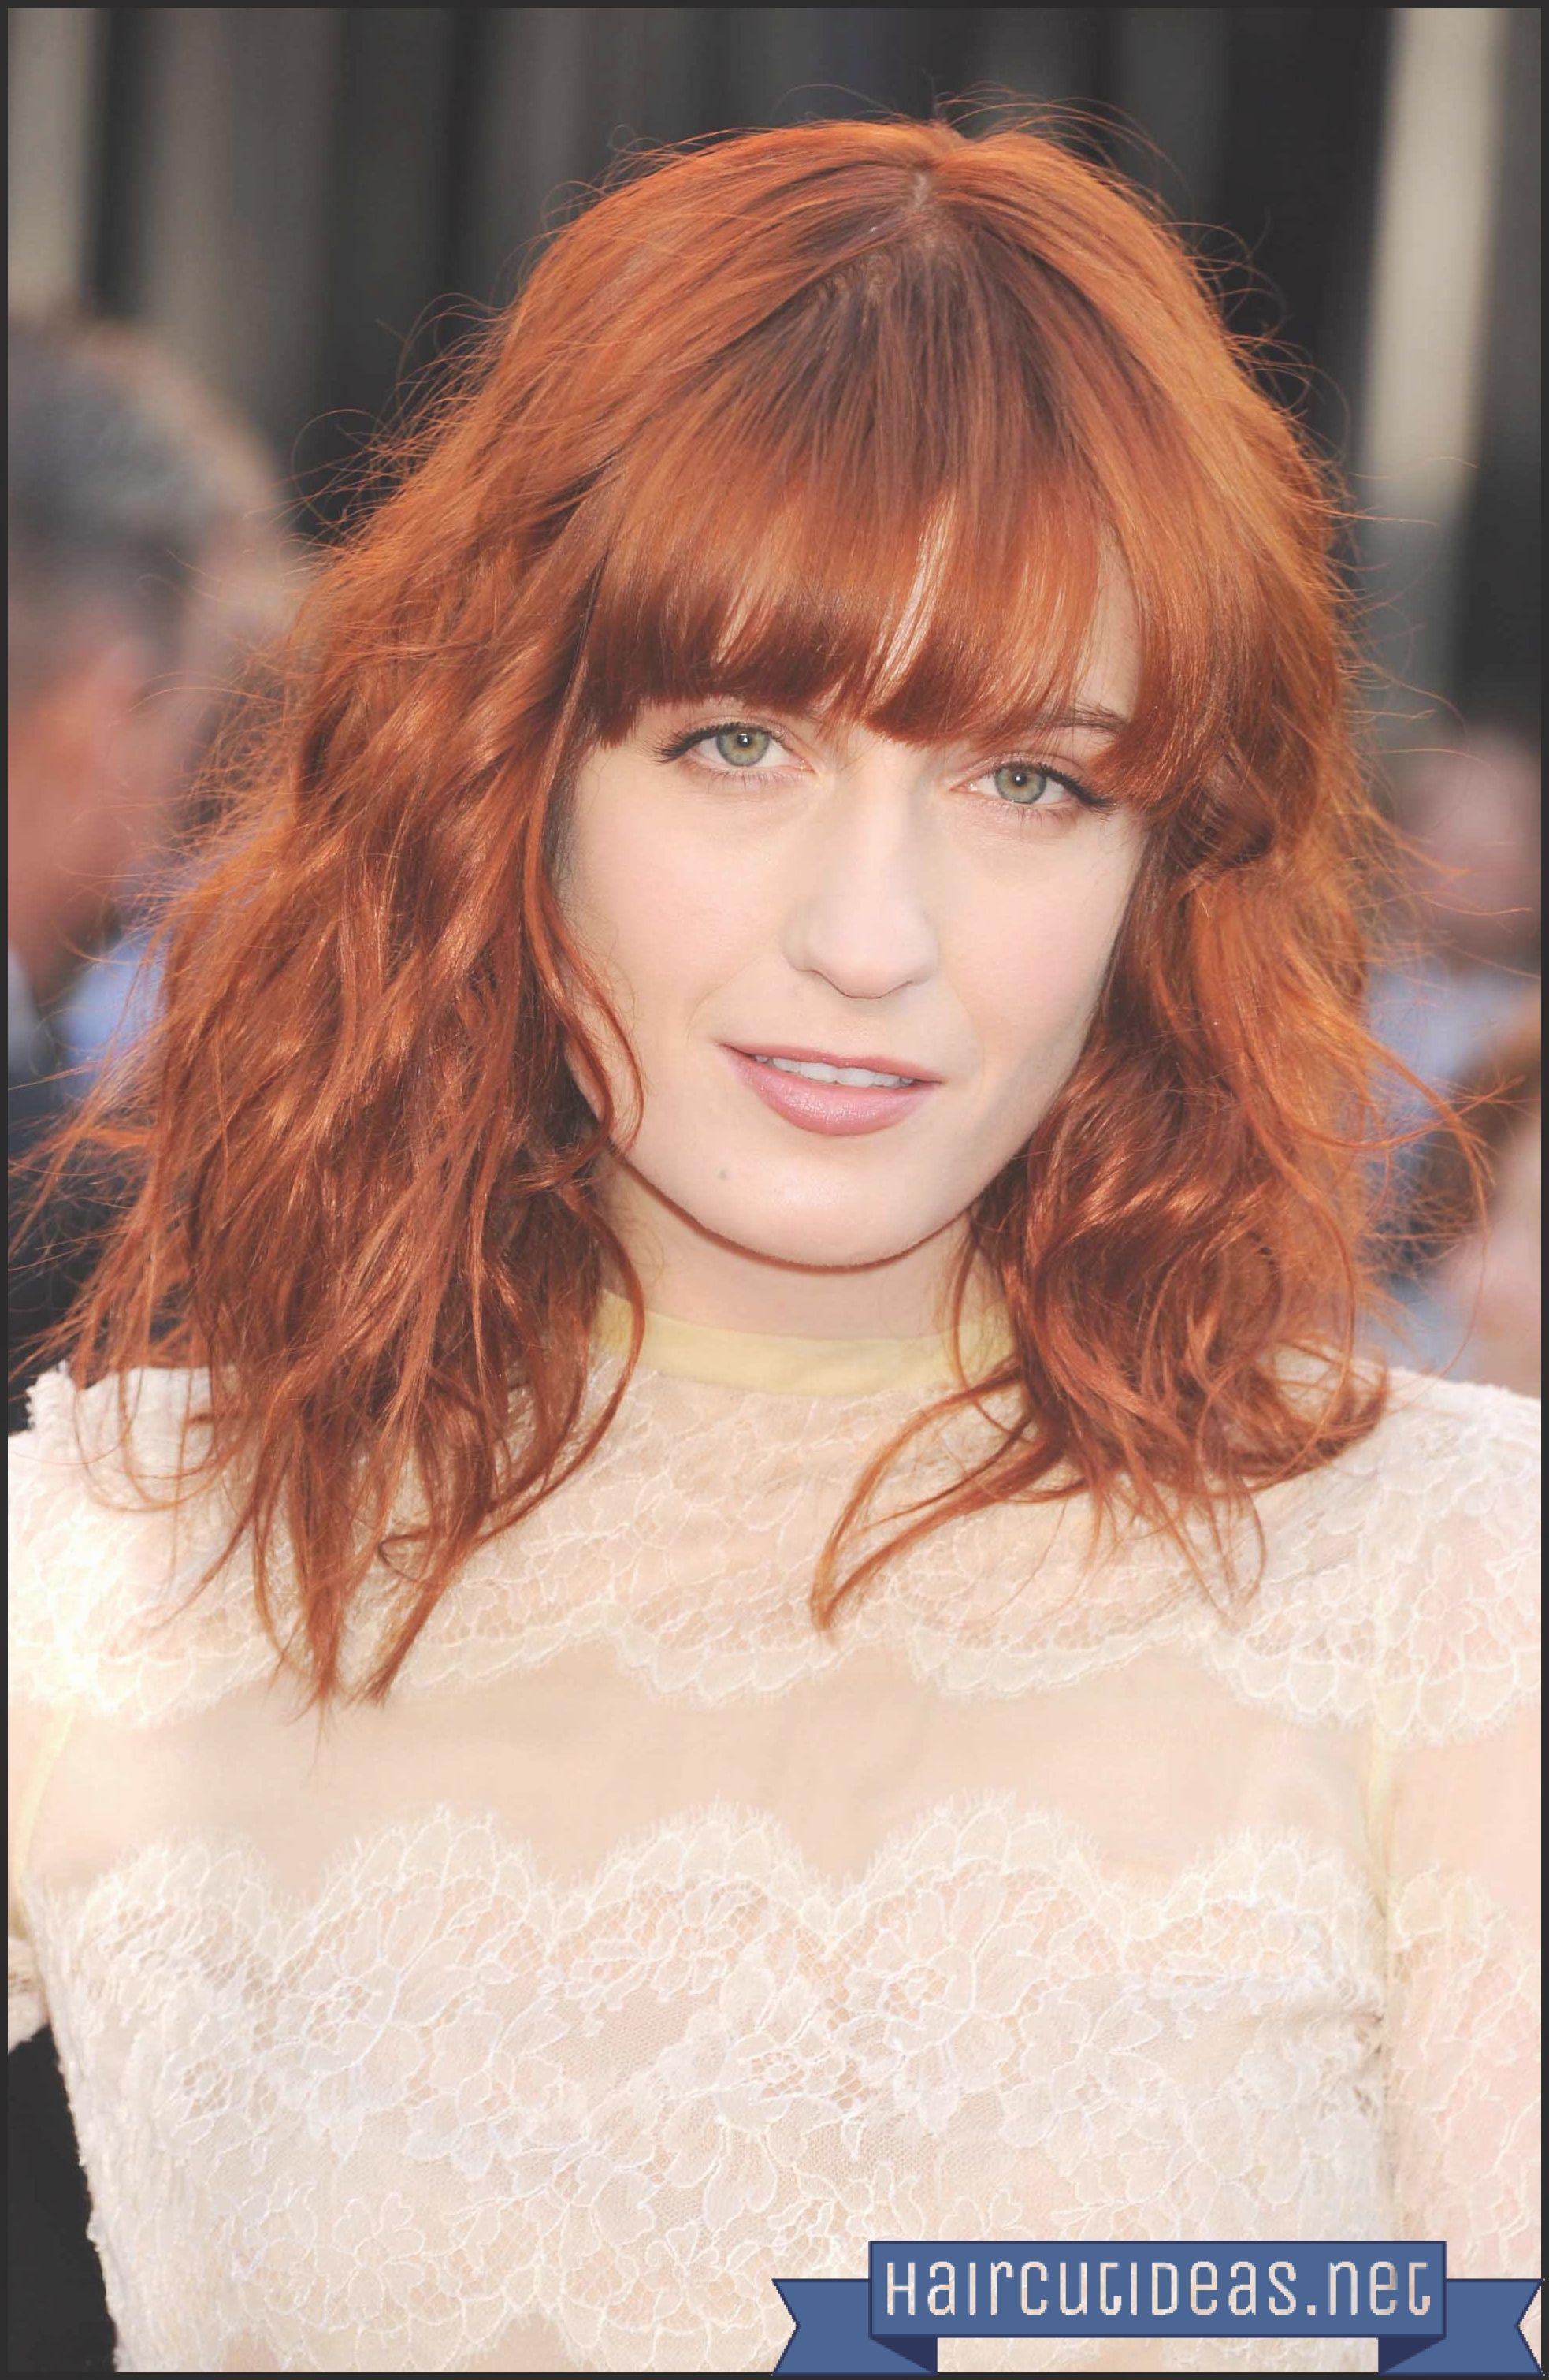 popular celebrity hairstyles 2018 | celebrity photos | pinterest